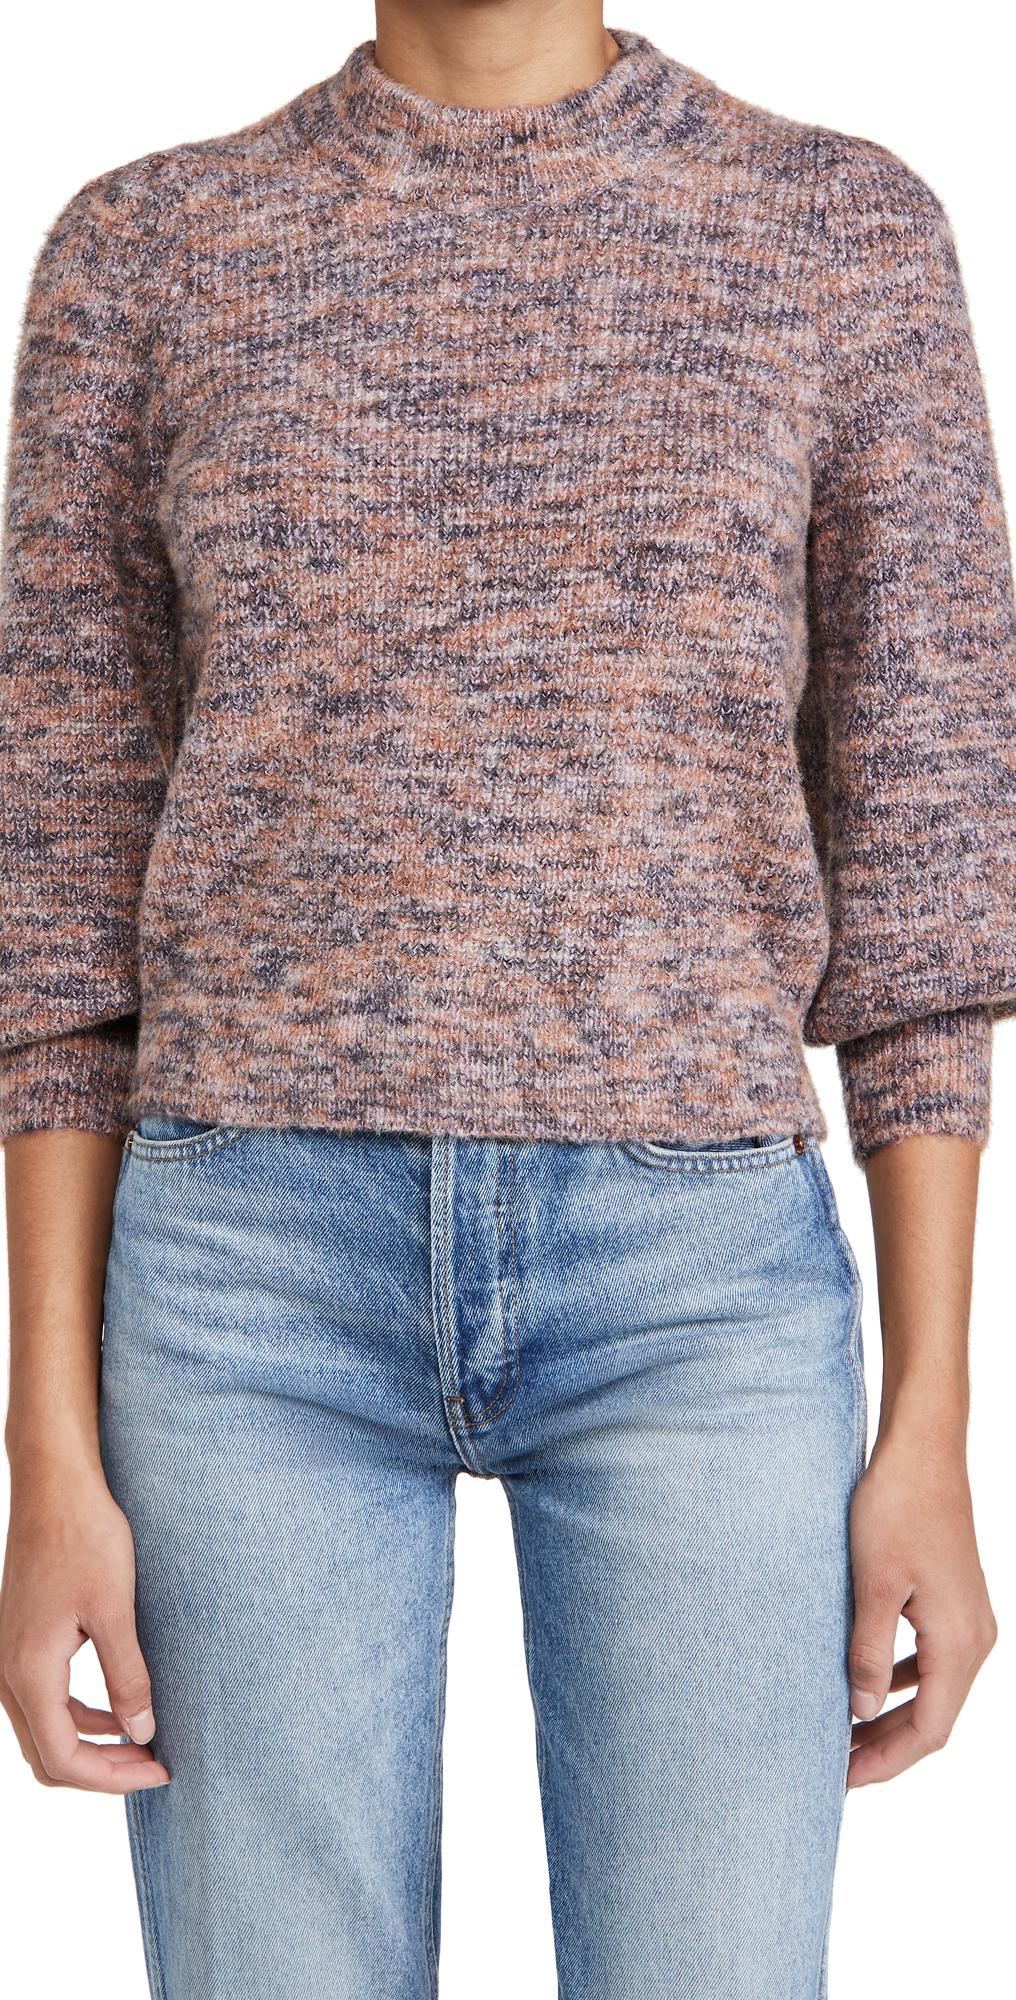 Madewell Nicole Puff Sleeve Pullover